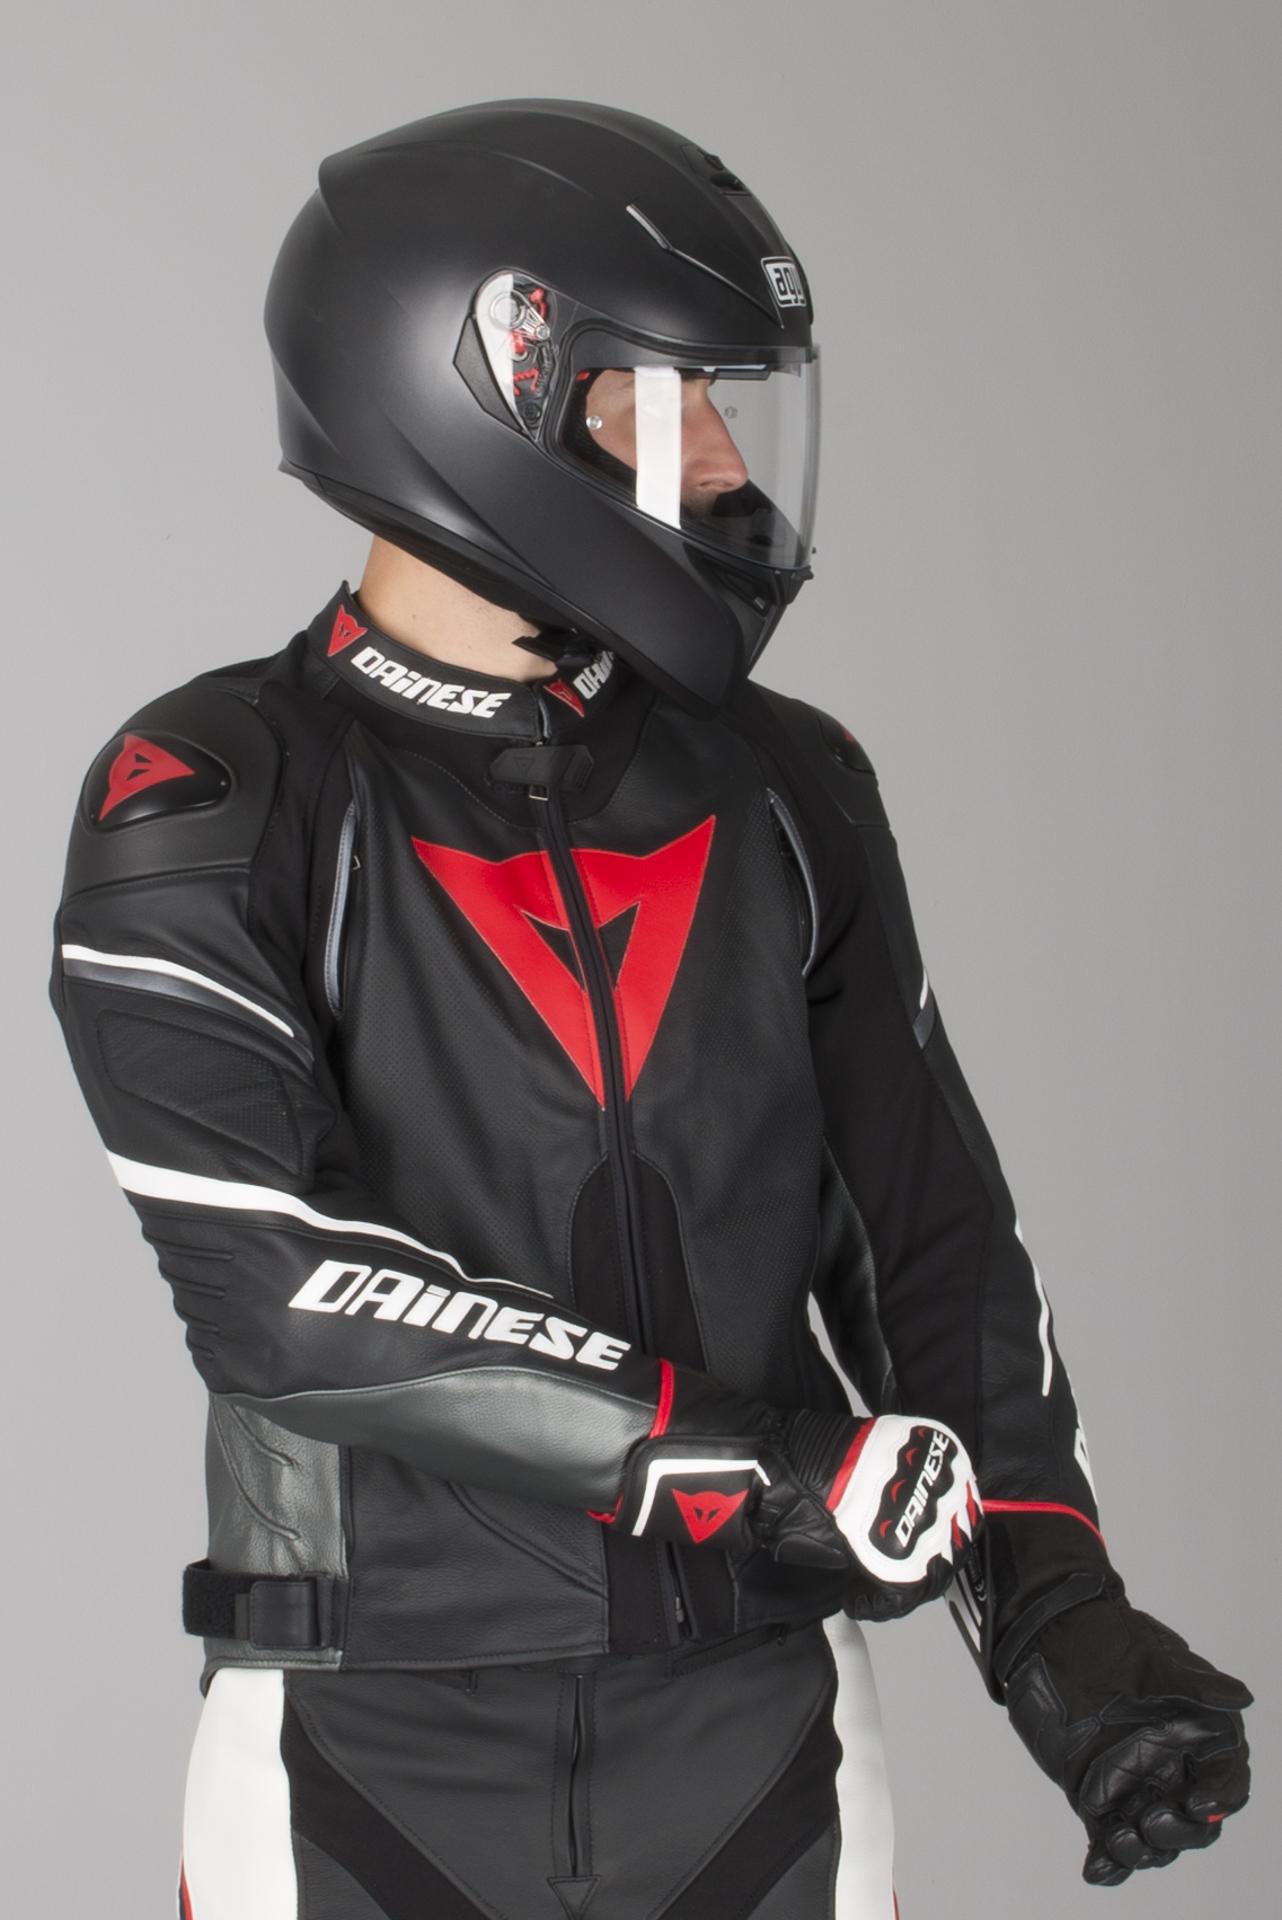 Lederjacke Dainese Super Speed D1 Weiß Schwarz Rot